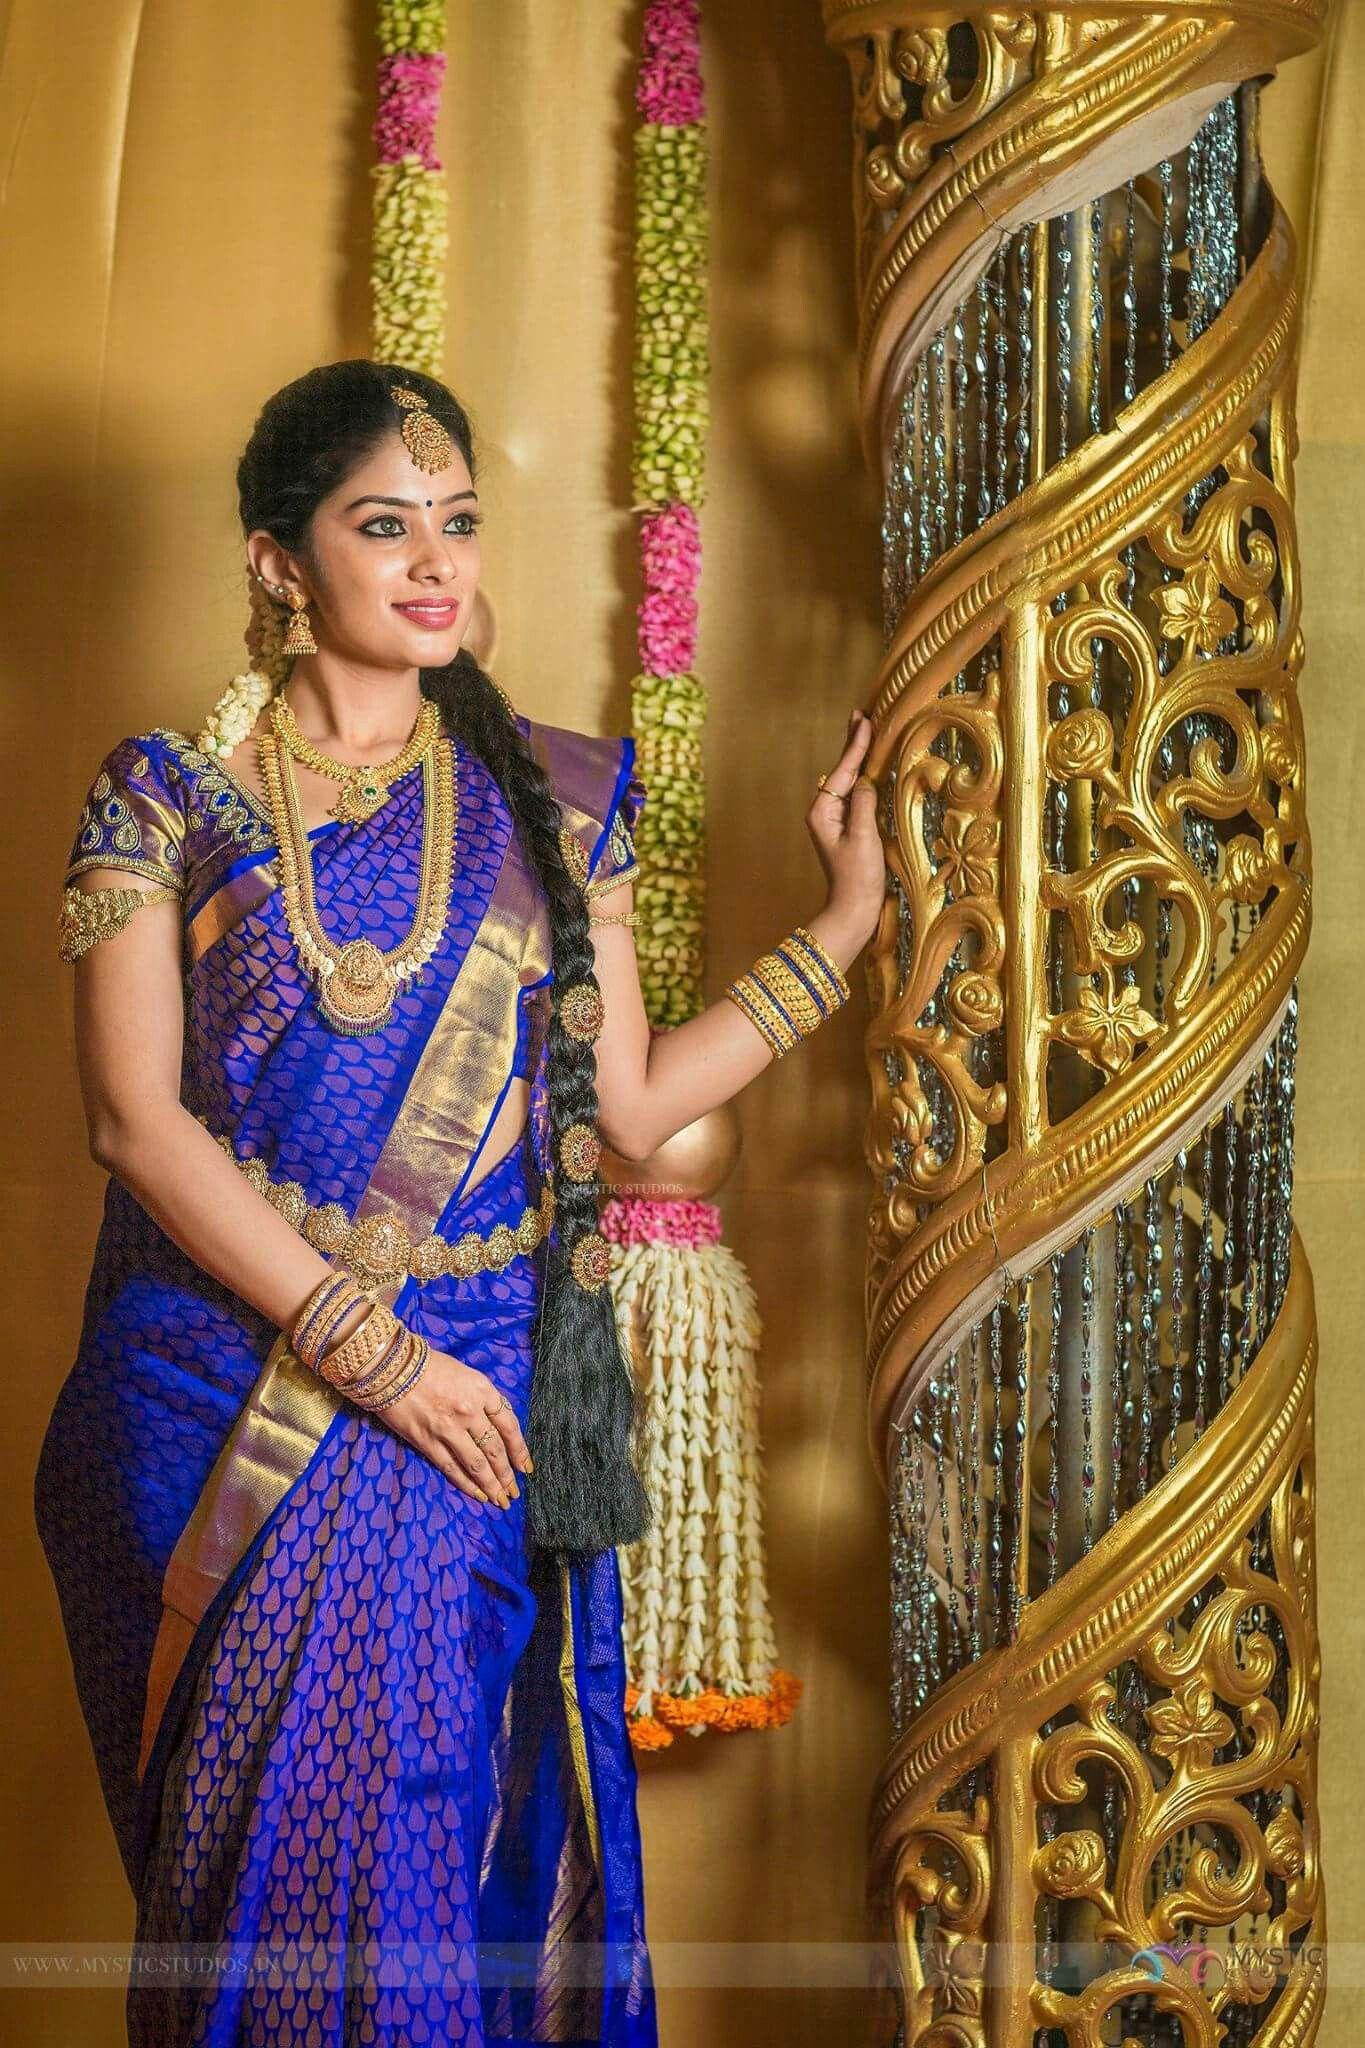 Pin by Almeena on Saree's South indian wedding saree